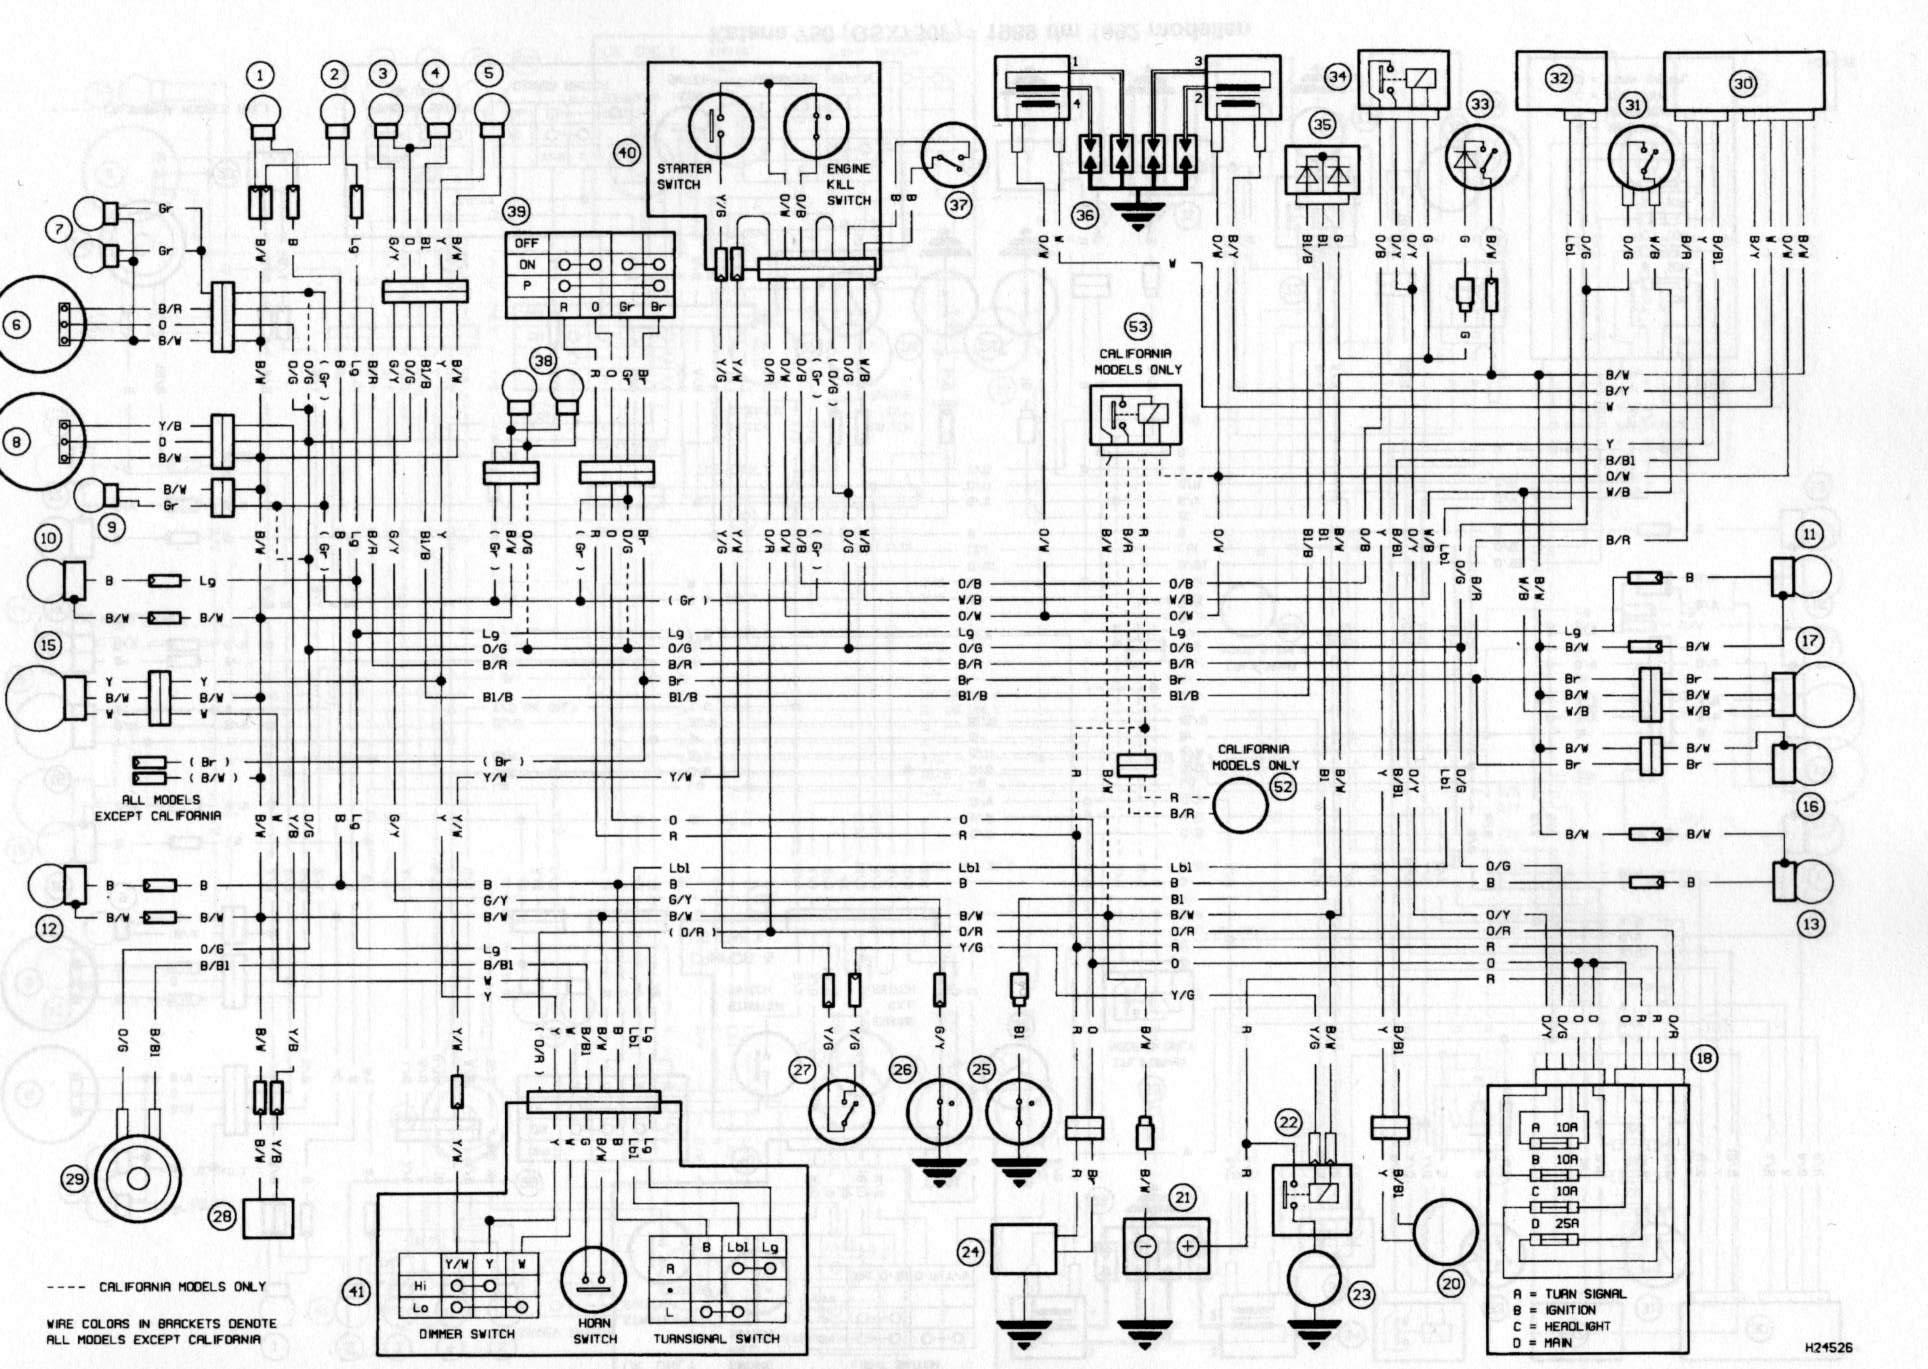 KA_8781] Diagrama Suzuki Gsx600F Gsx750F Free DiagramWida Tobiq Itis Barep Lite Cajos Mohammedshrine Librar Wiring 101